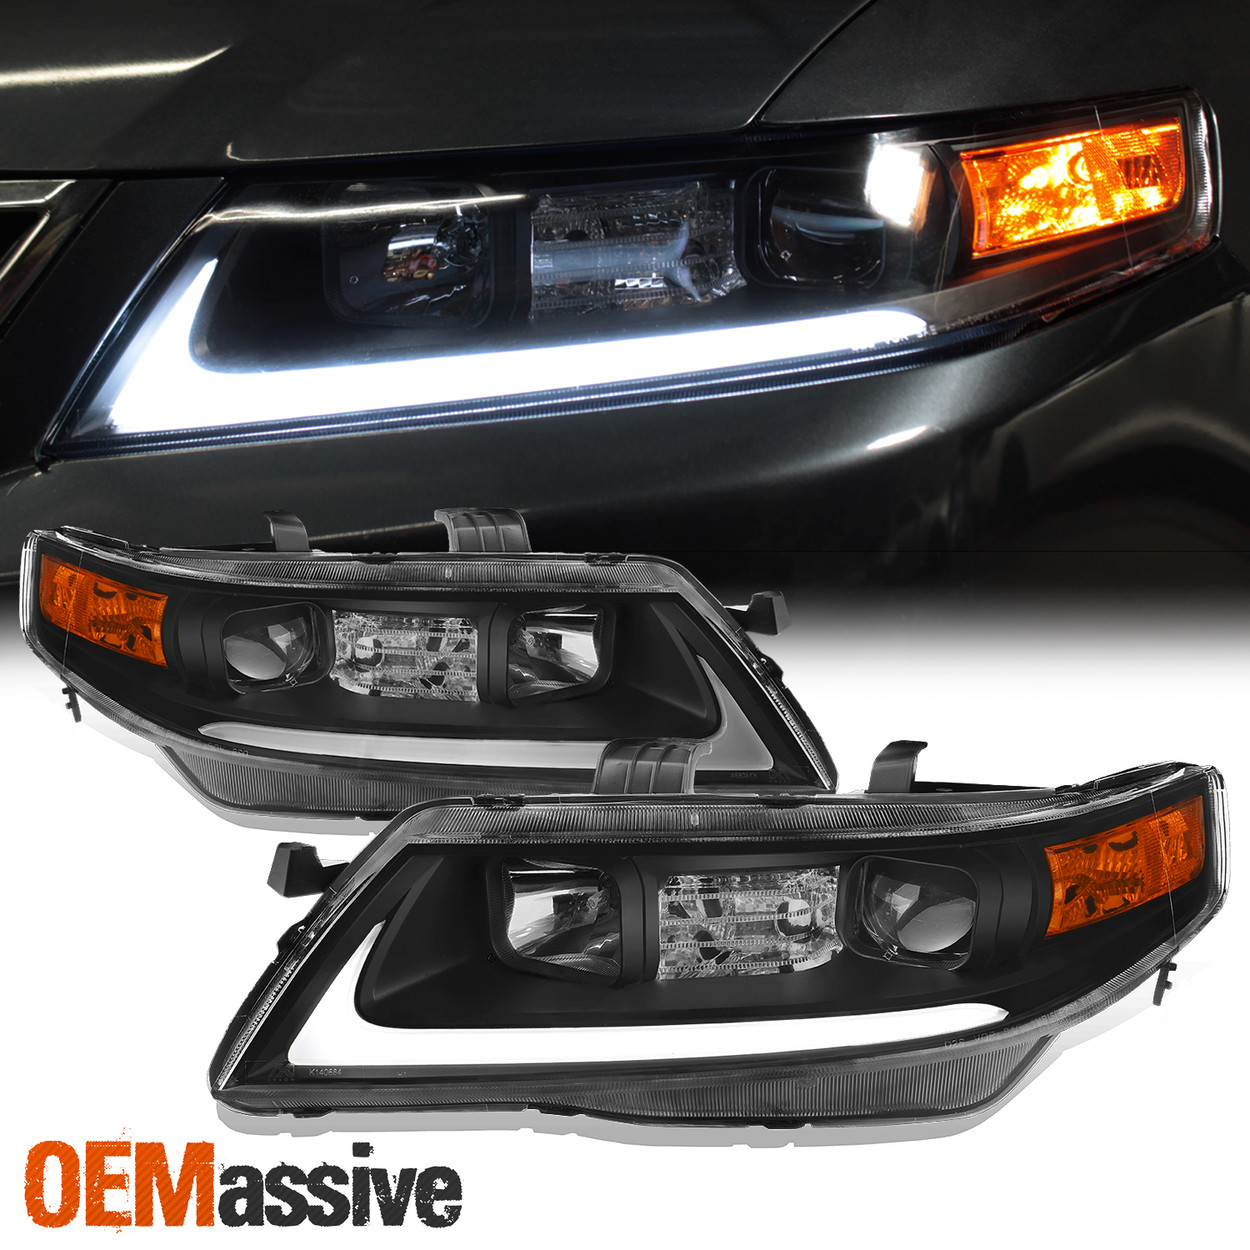 Black Fits 2004 2005 2006 2007 2008 Acura Tsx Led Bar Projector Headlights Oemassive